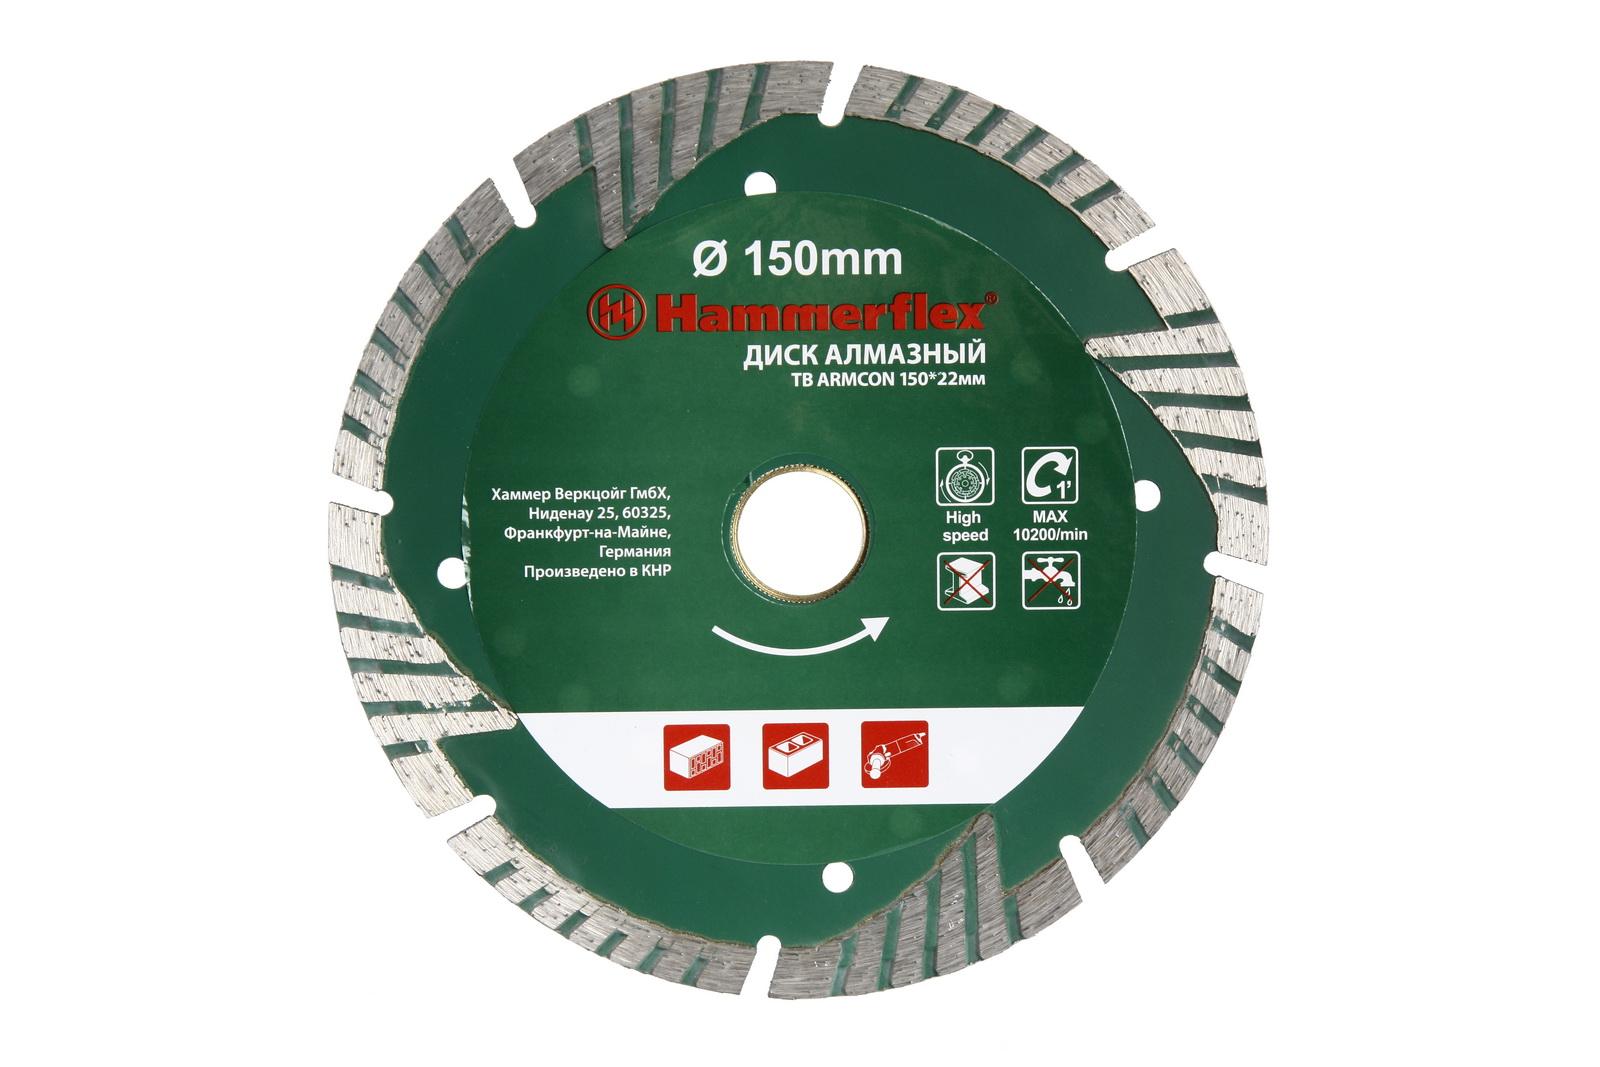 Круг алмазный Hammer 206-123 db tb armcon диск алмазный diam 150х22 2мм master турбо 000160